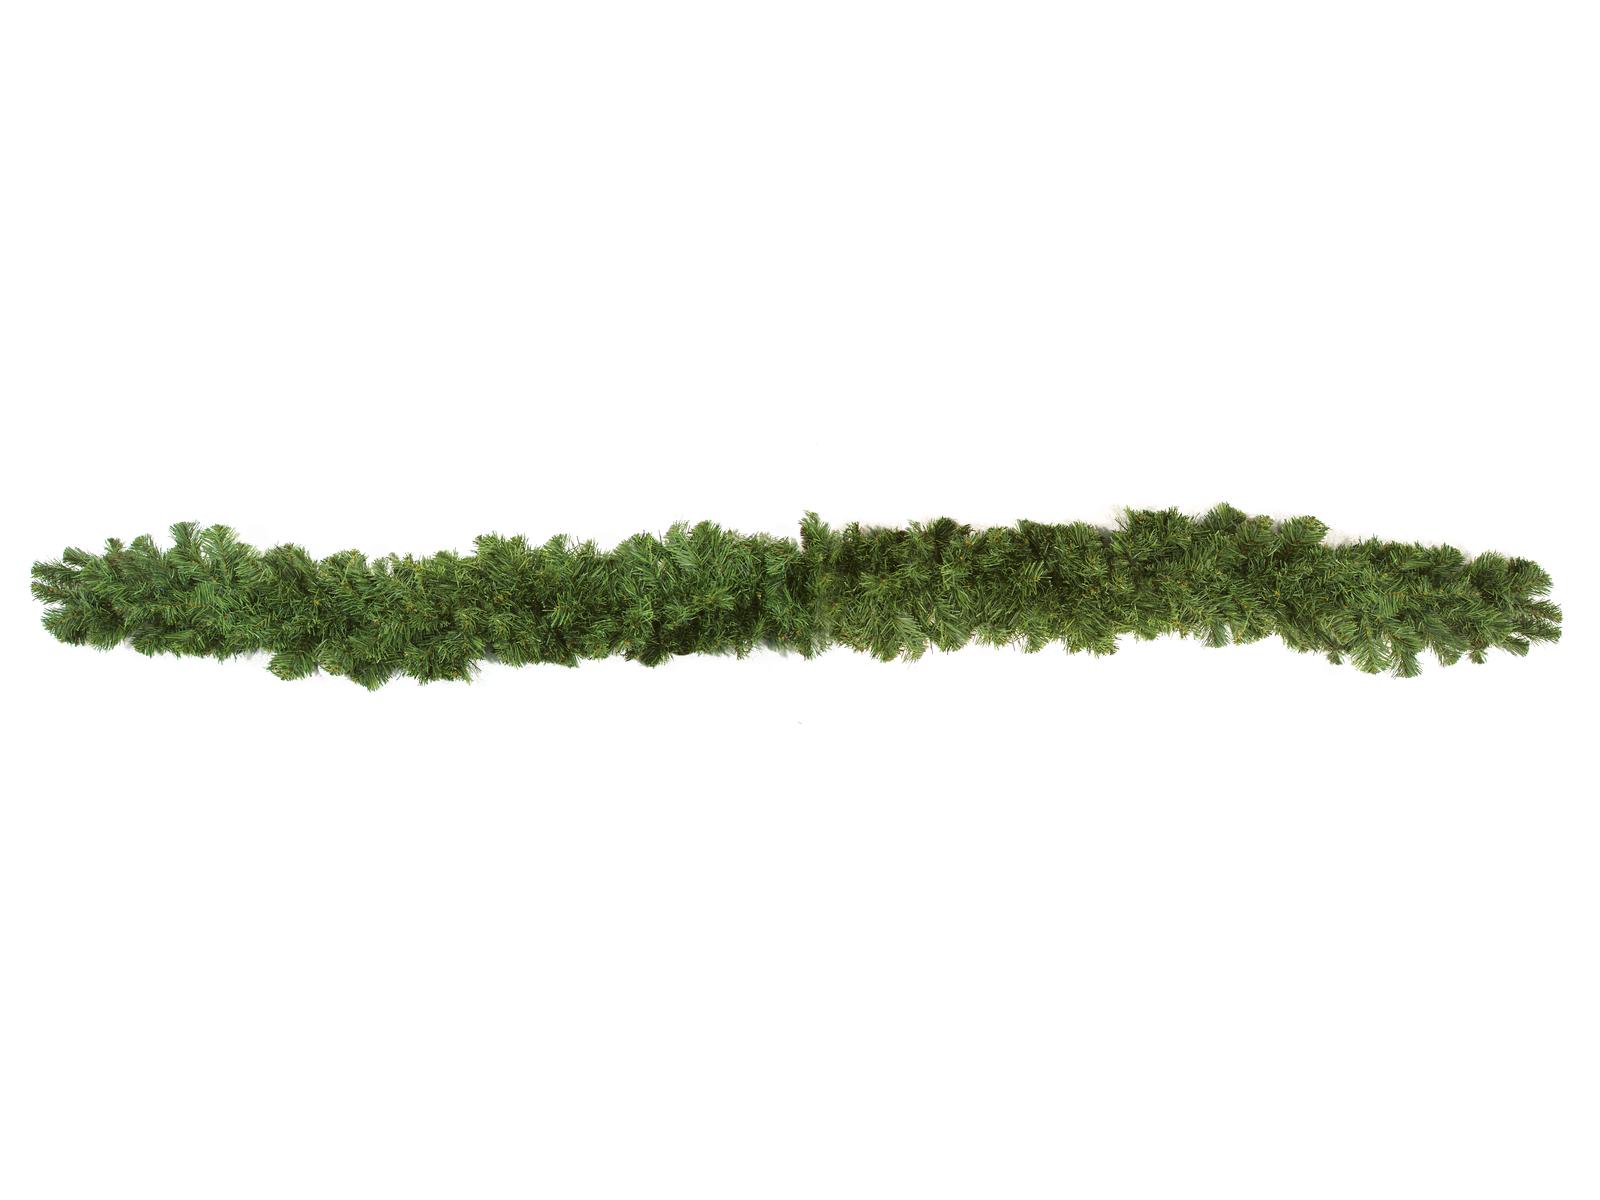 Jedlová girlanda 270 cm